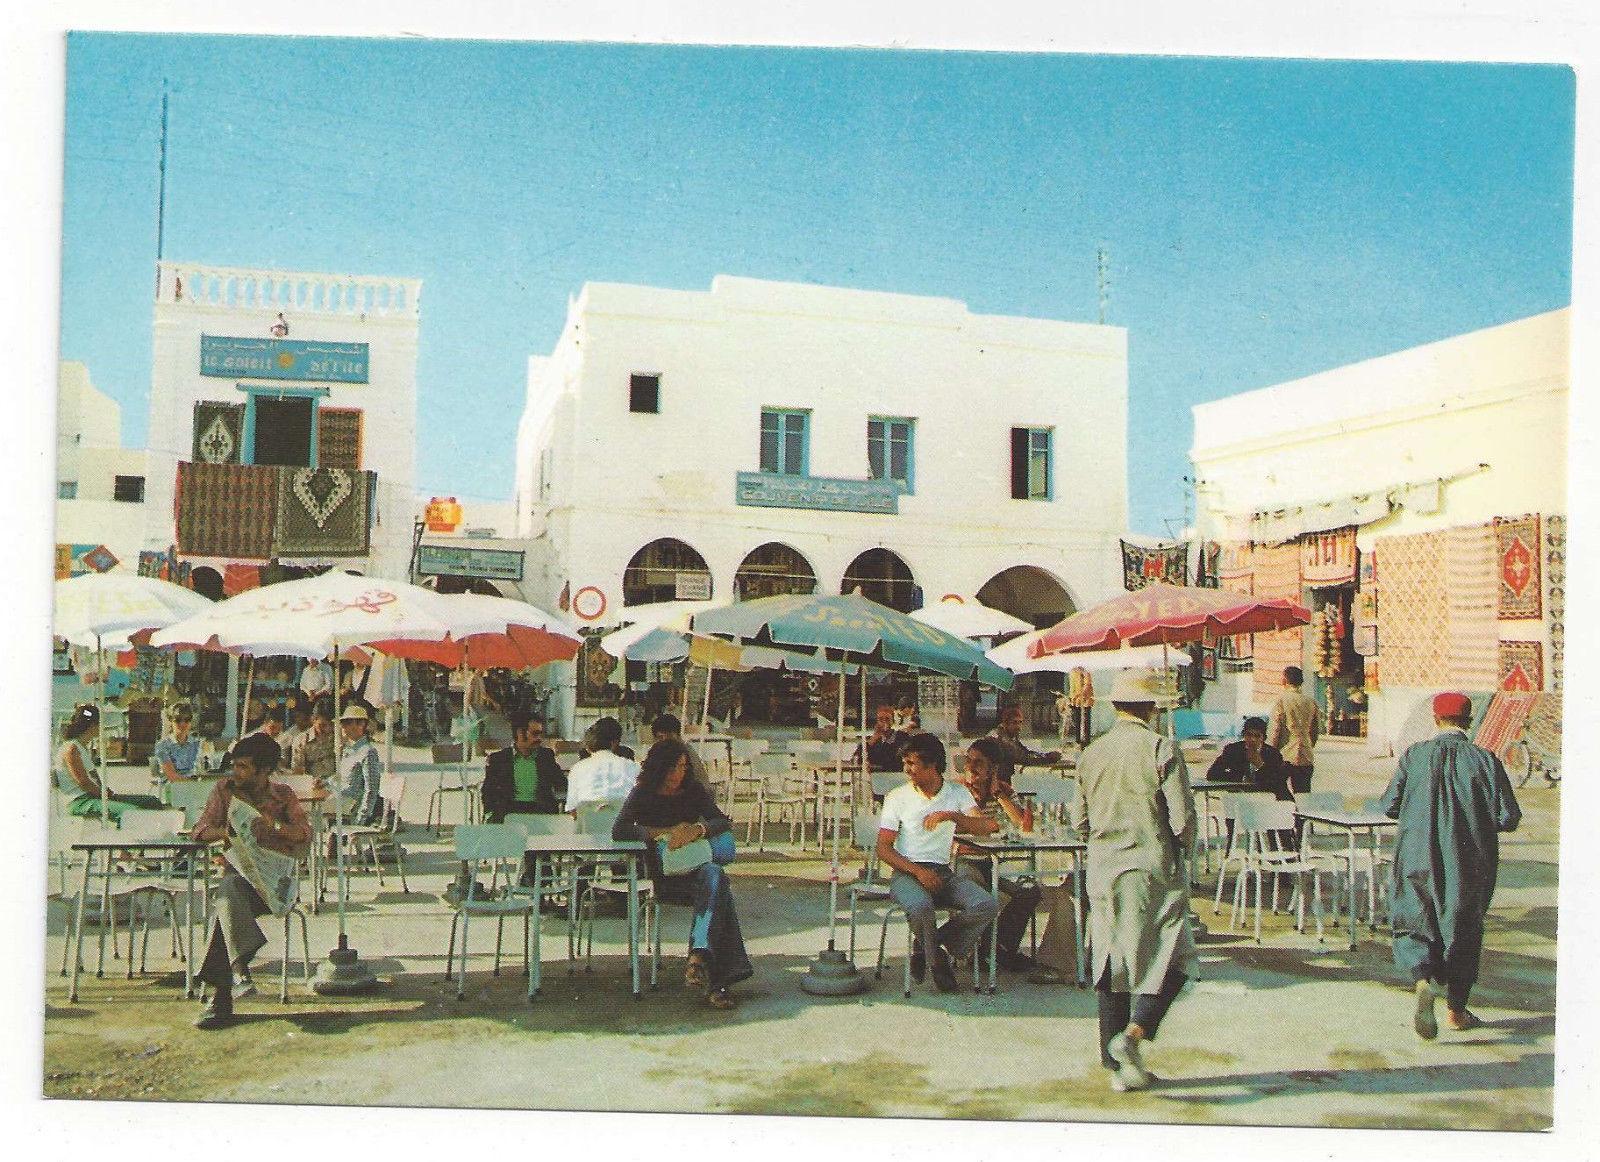 Tunisia Djerba Houmt Souk Market Neighborhood Cafe Jerba Vtg Postcard 4X6